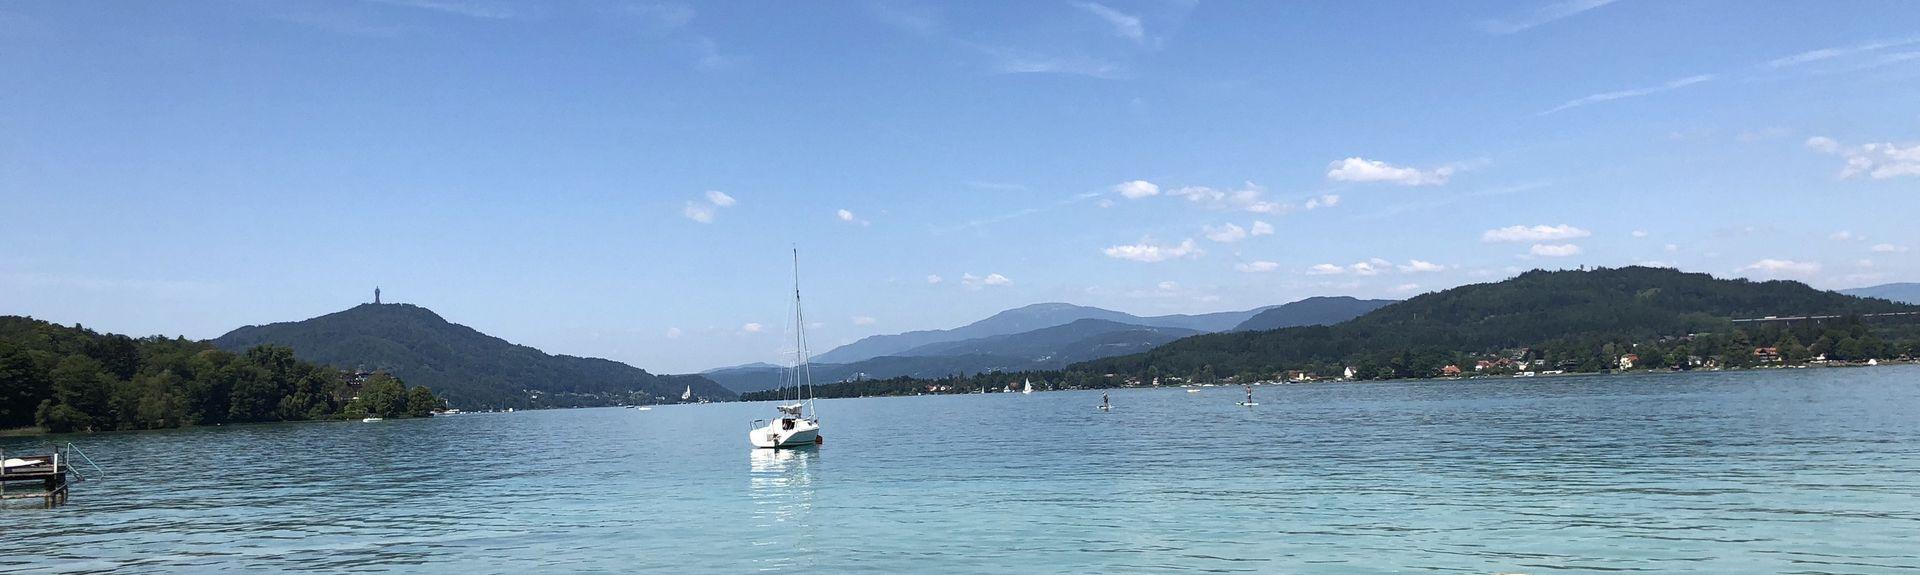 Sankt Egyden, Kärnten, Austria